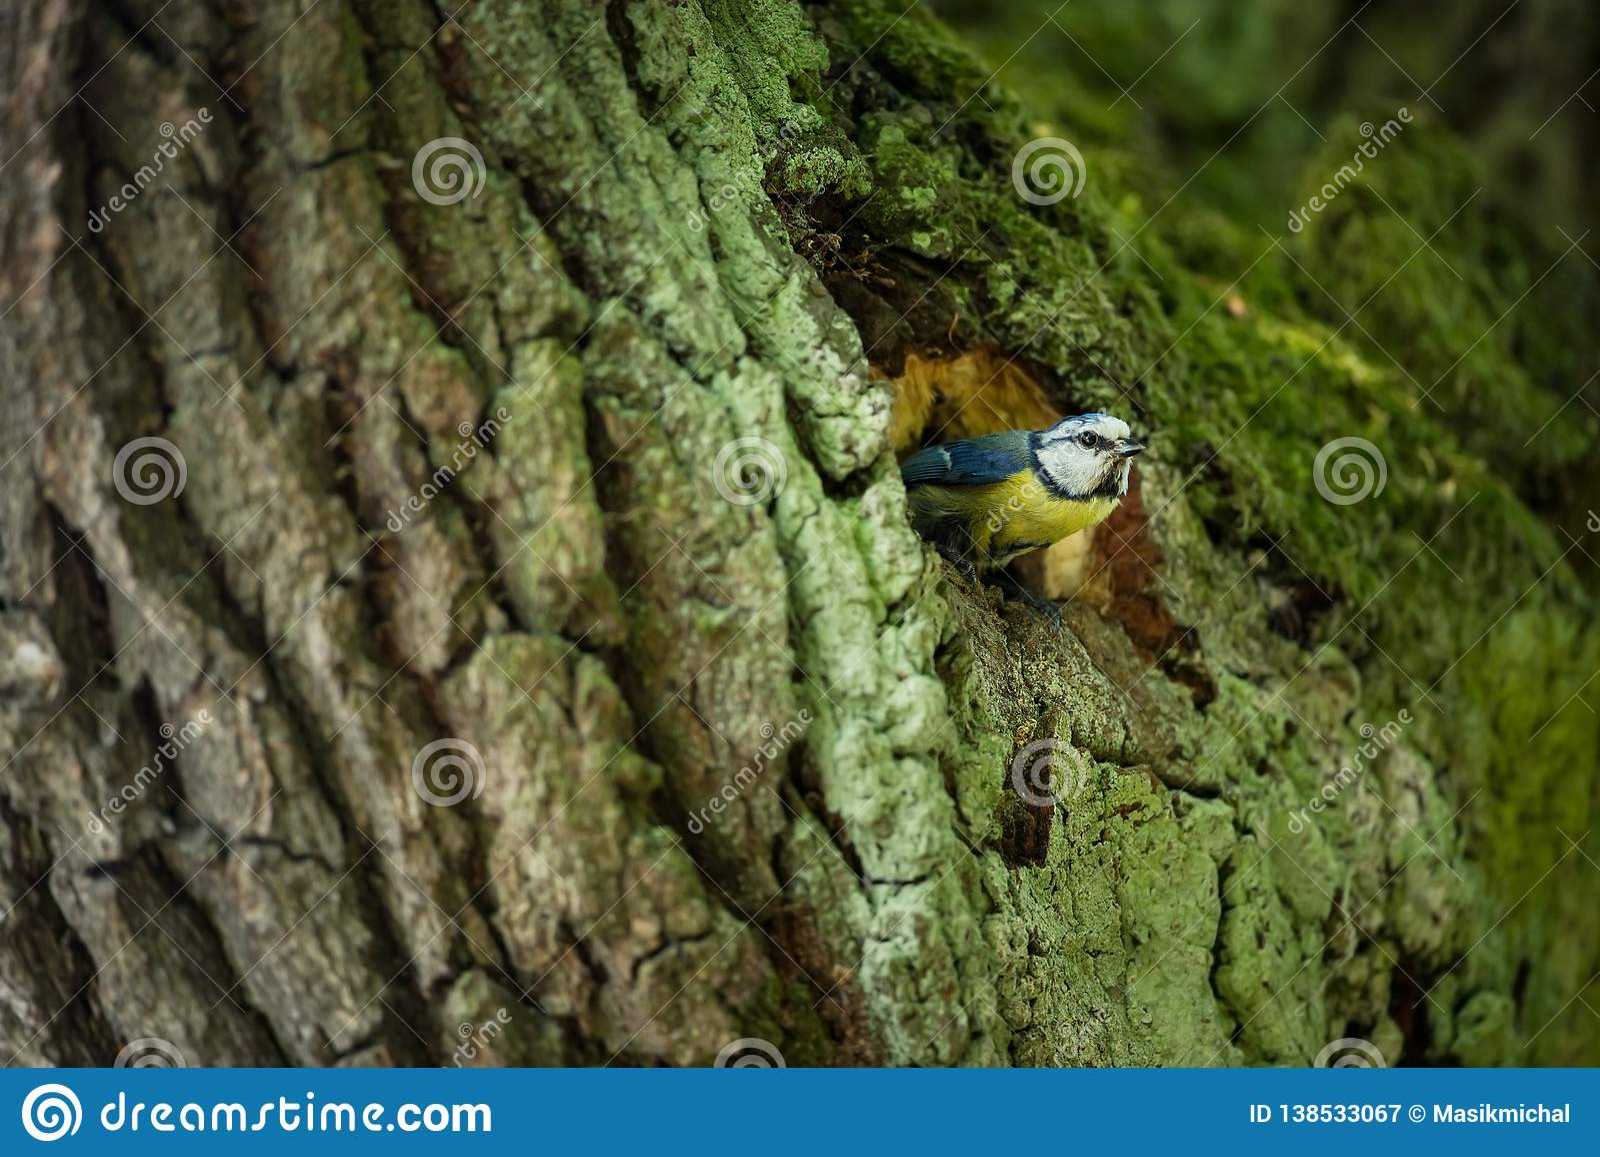 Caeruleus Cyanistes wildlife E όμορφη εικόνα ελεύθερη φύση Από τη ζωή πουλιών Άνοιξη Μπλε πουλί